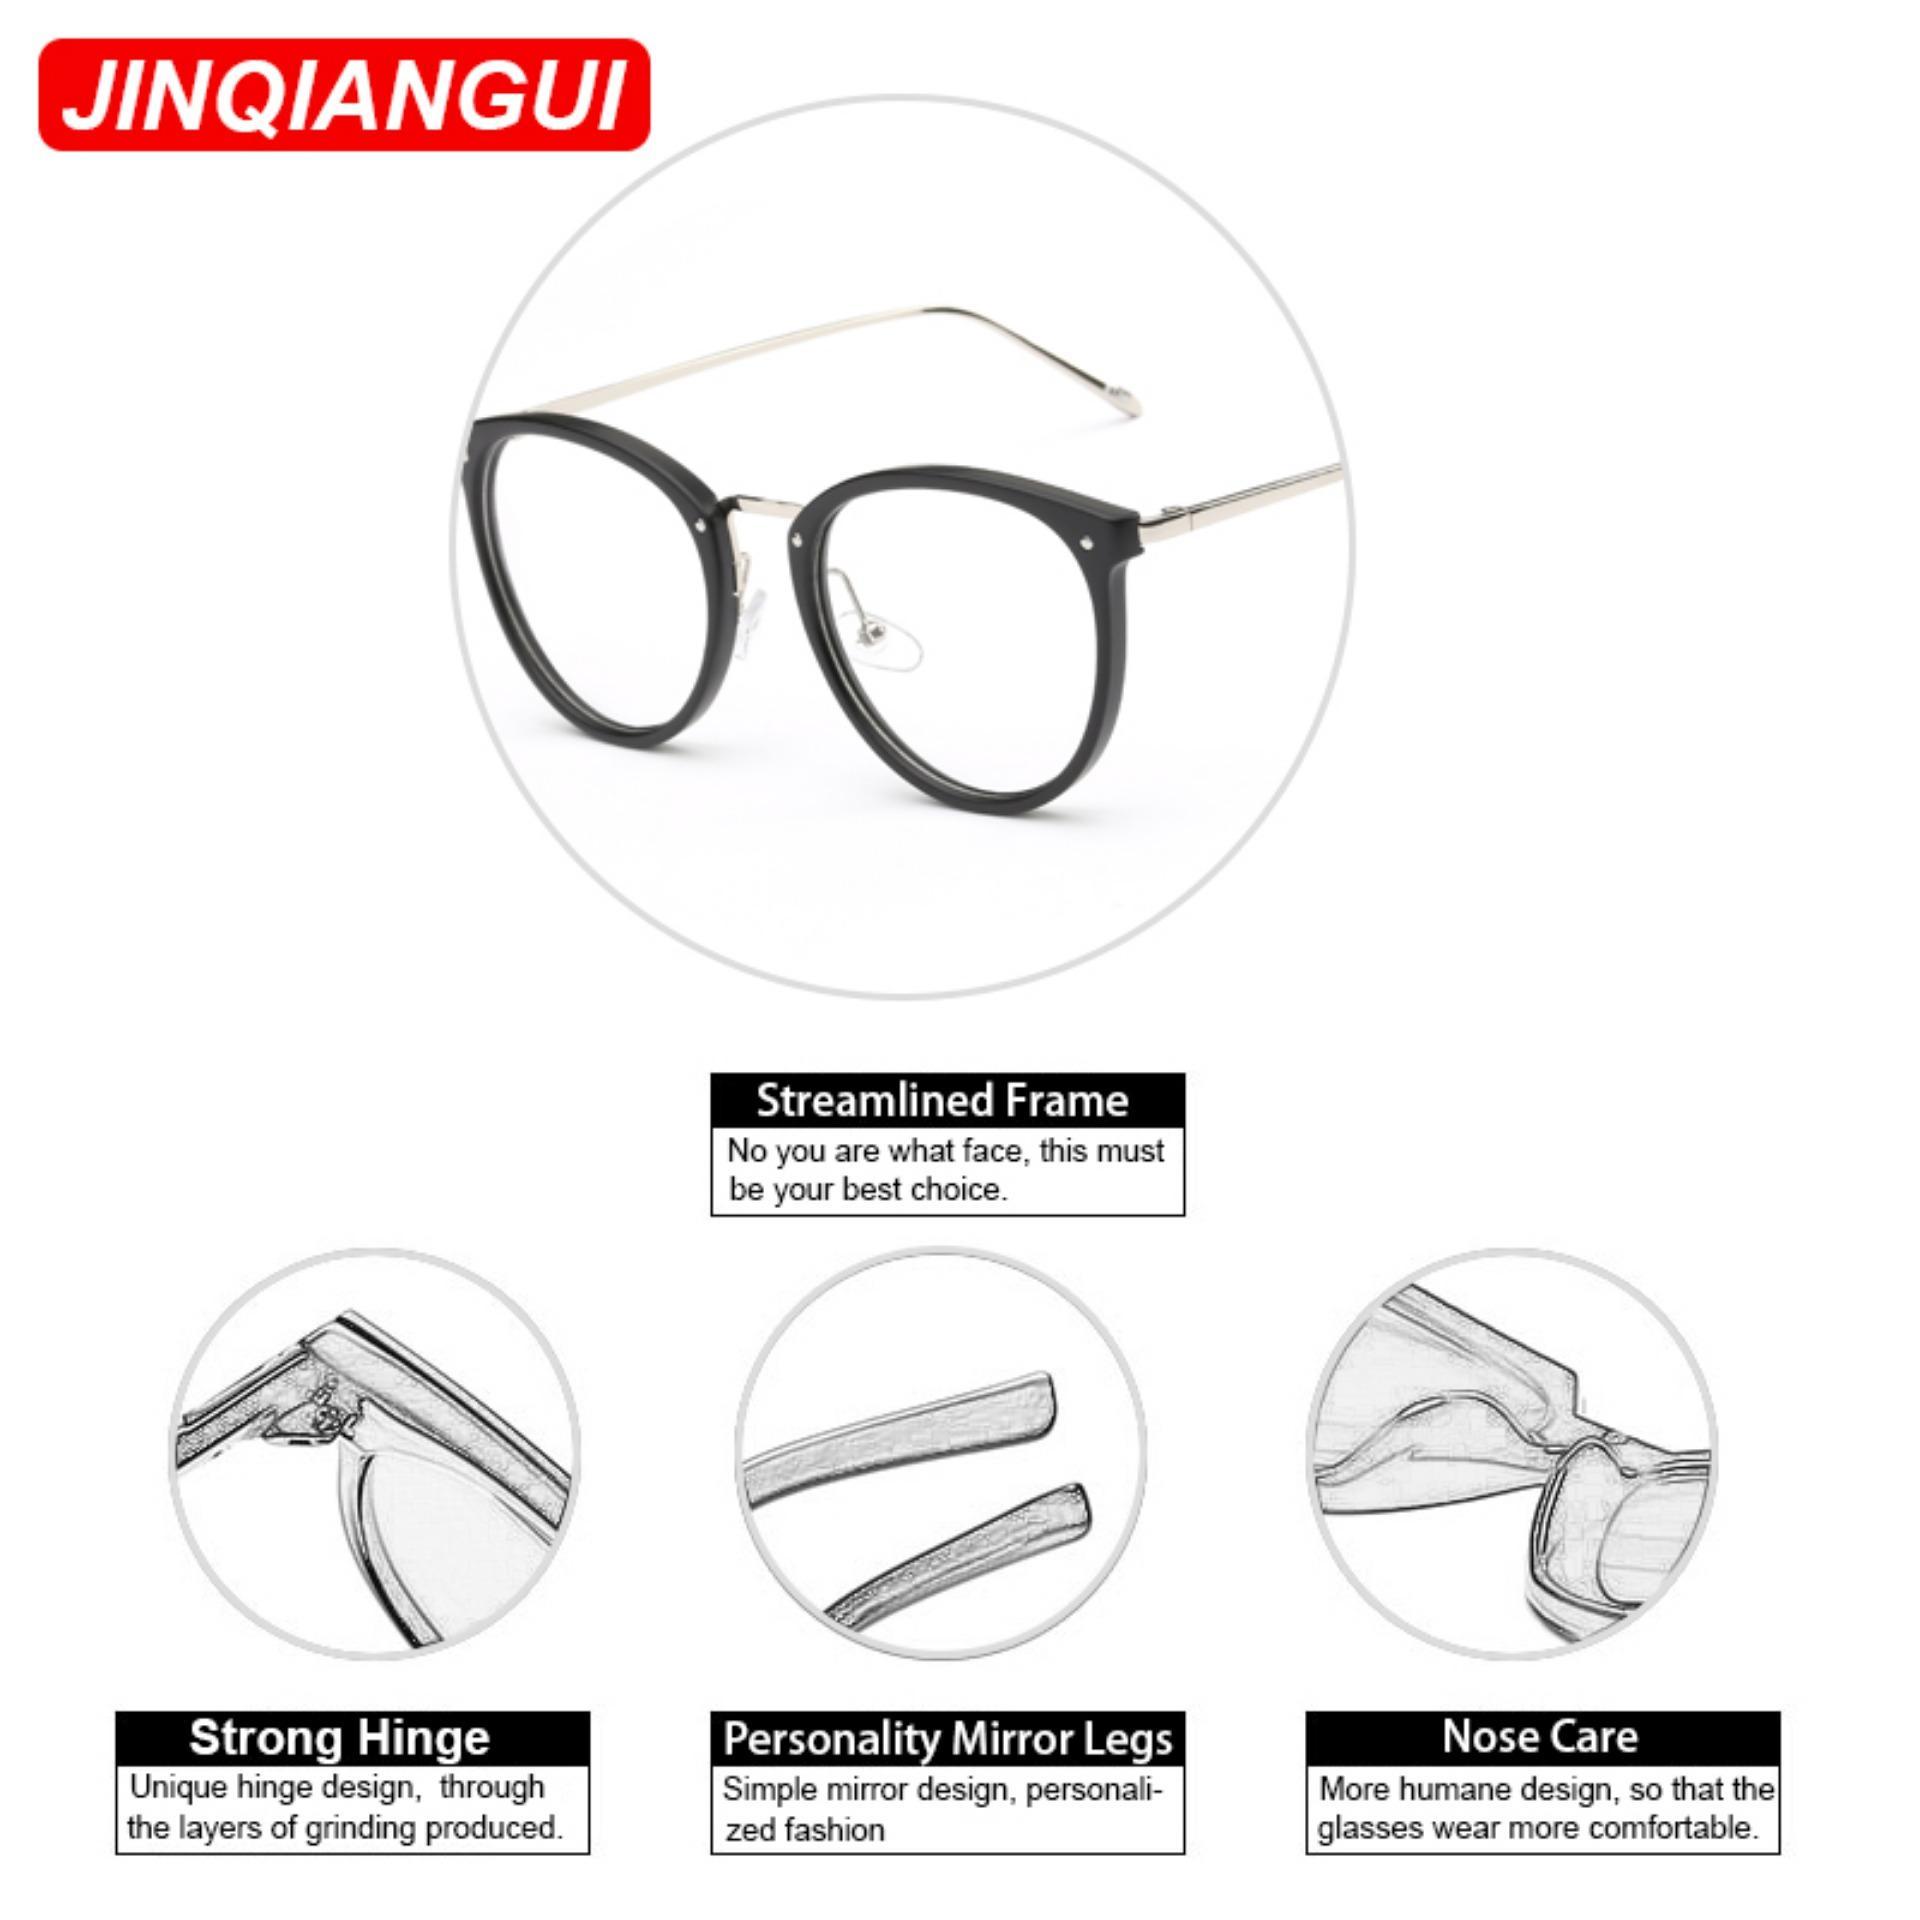 ... Fashion Vintage Retro Round Glasses Brown Frame Glasses Plain for Myopia Women Eyeglasses Optical Frame Glasses ...